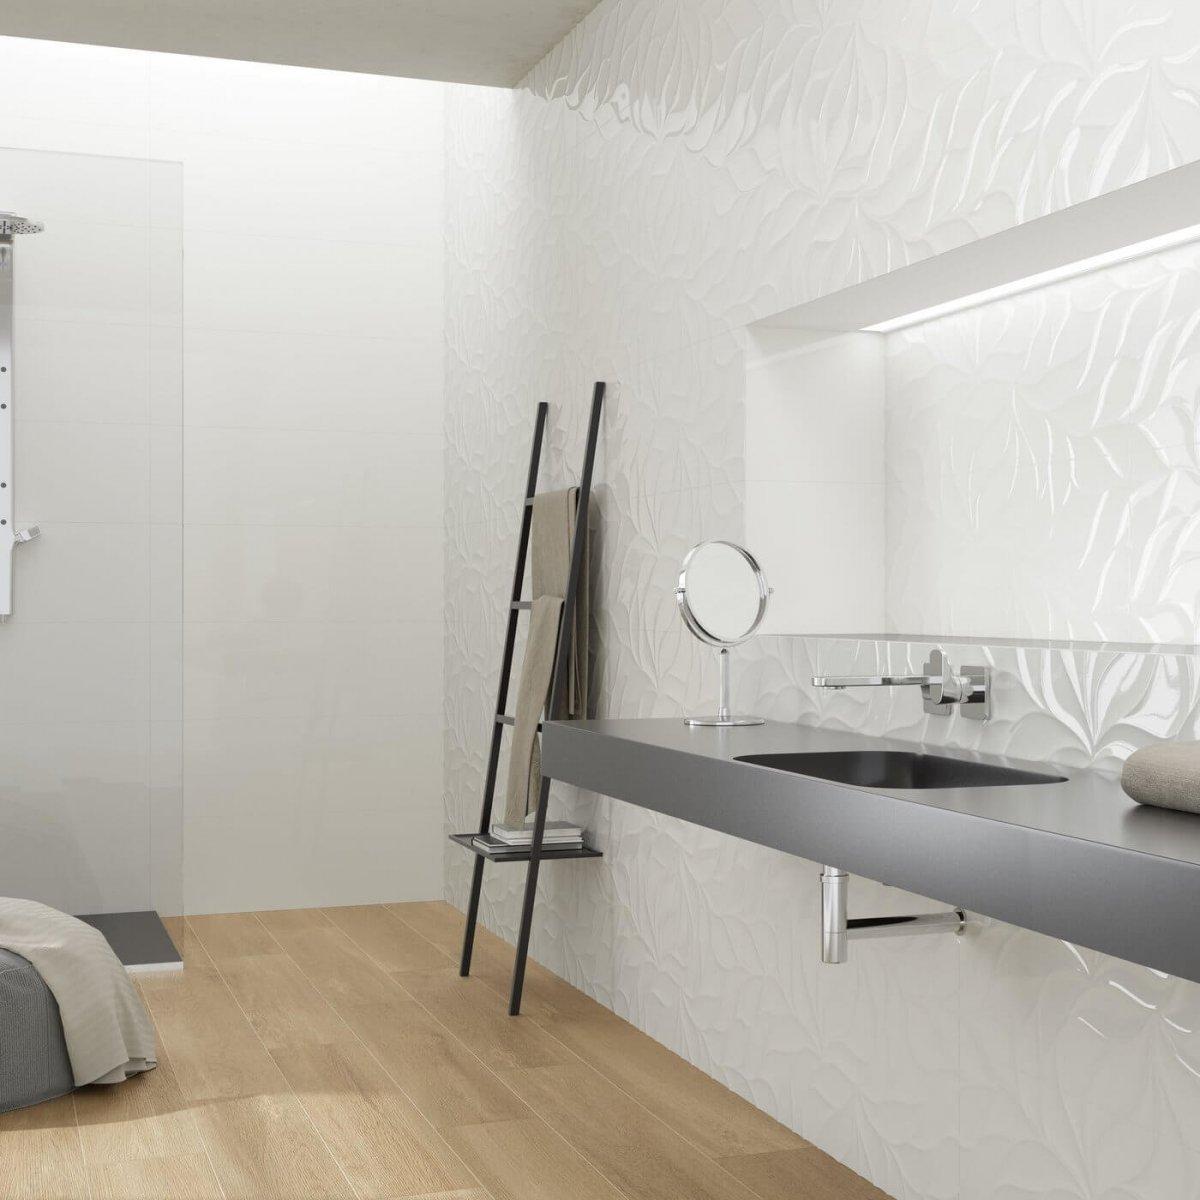 AB Blanco Brillo Rectified 300x900mm_Stiles_Lifestyle_Image2